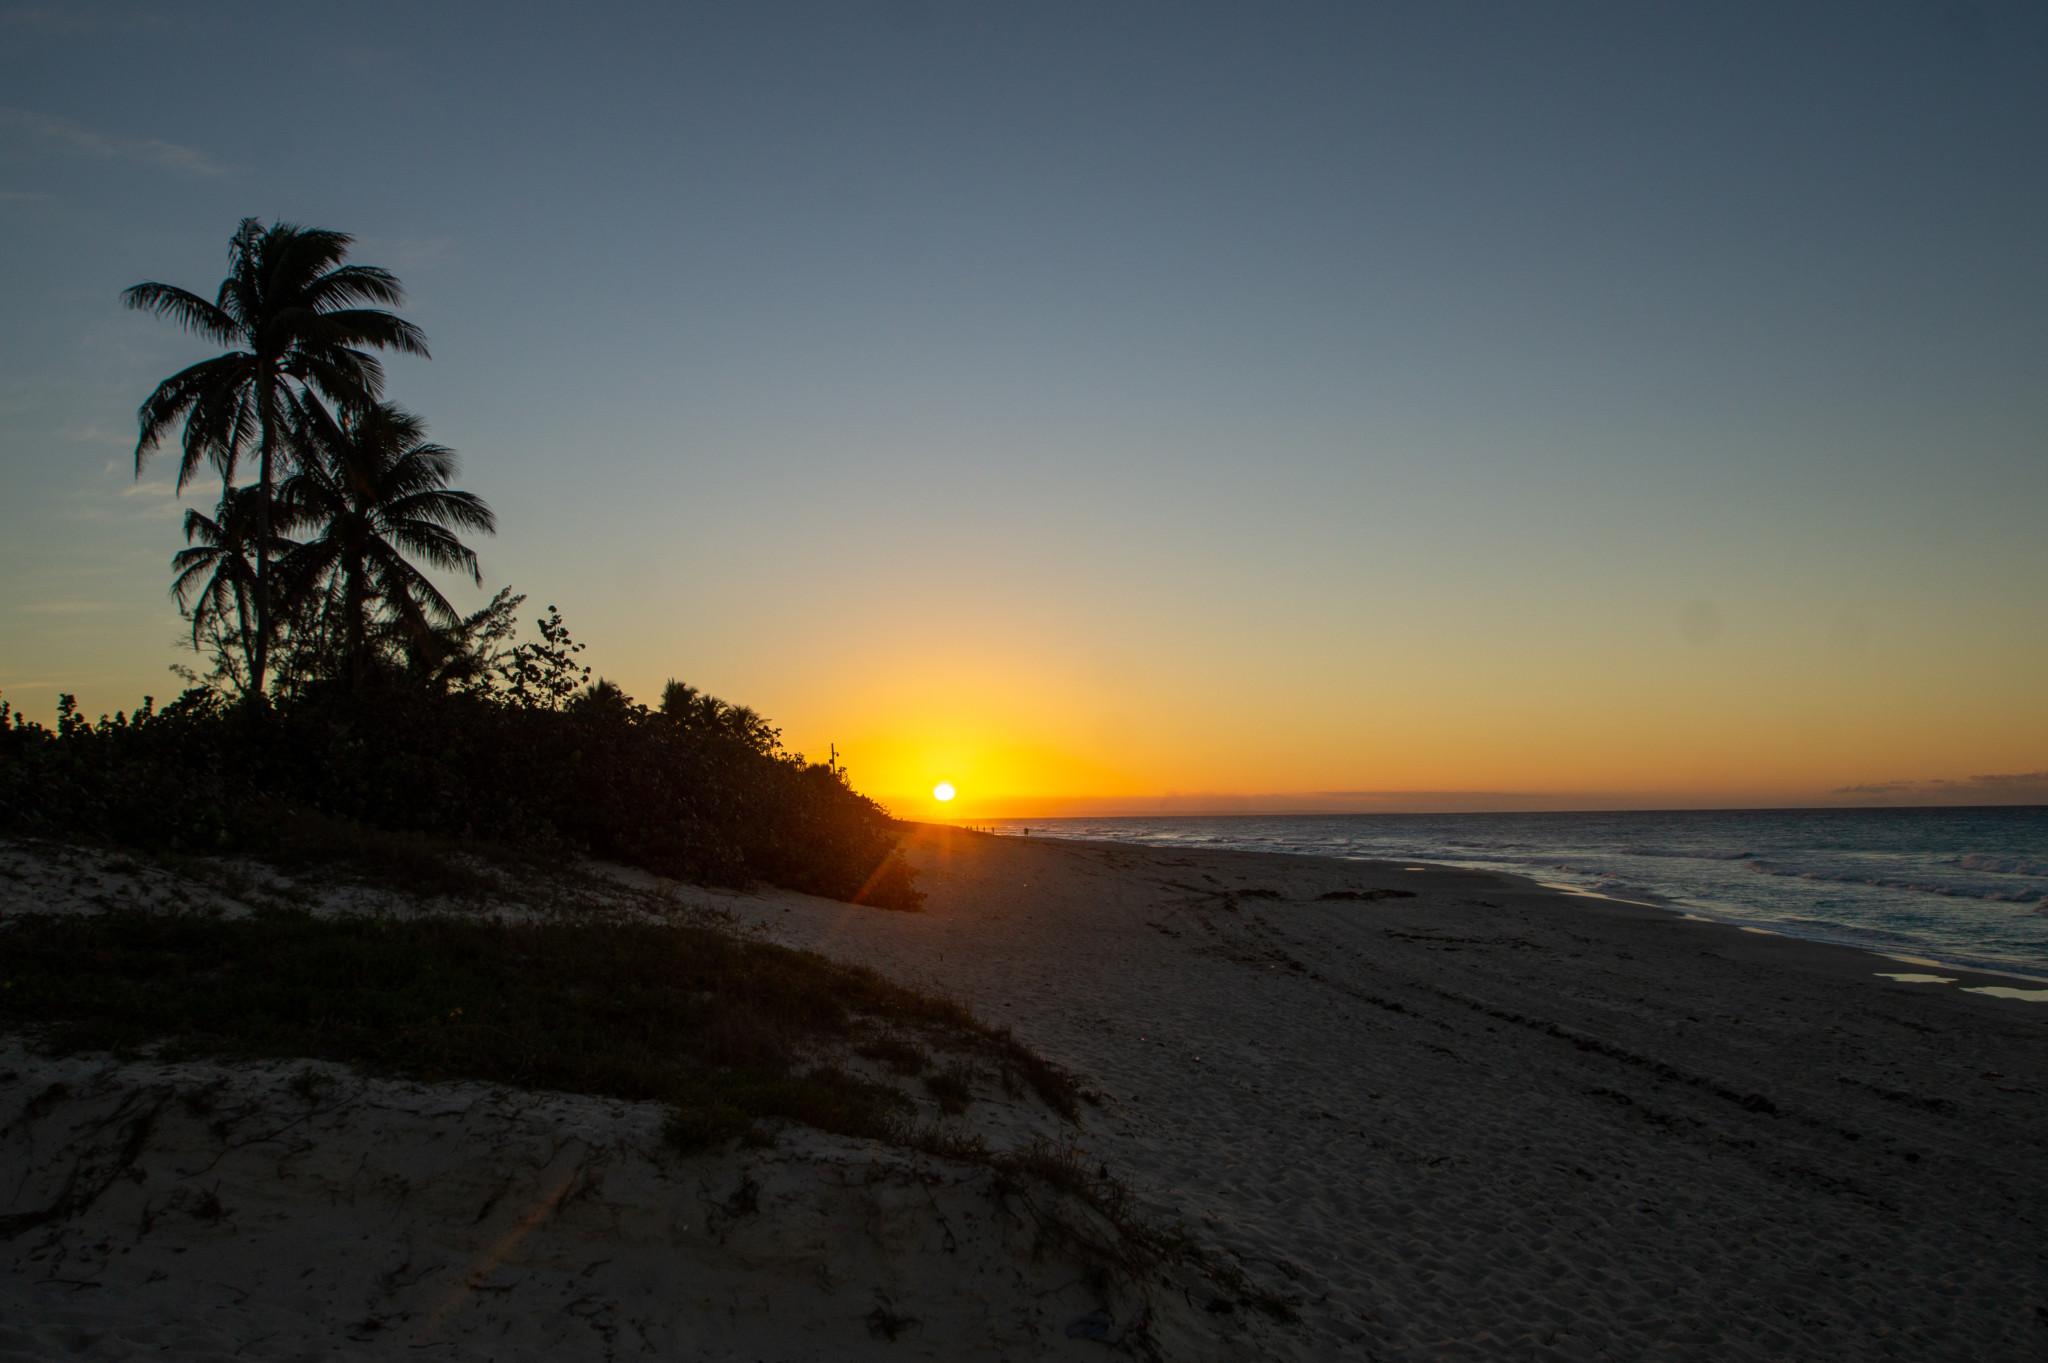 Sonnenuntergang an Kubas Ostküste